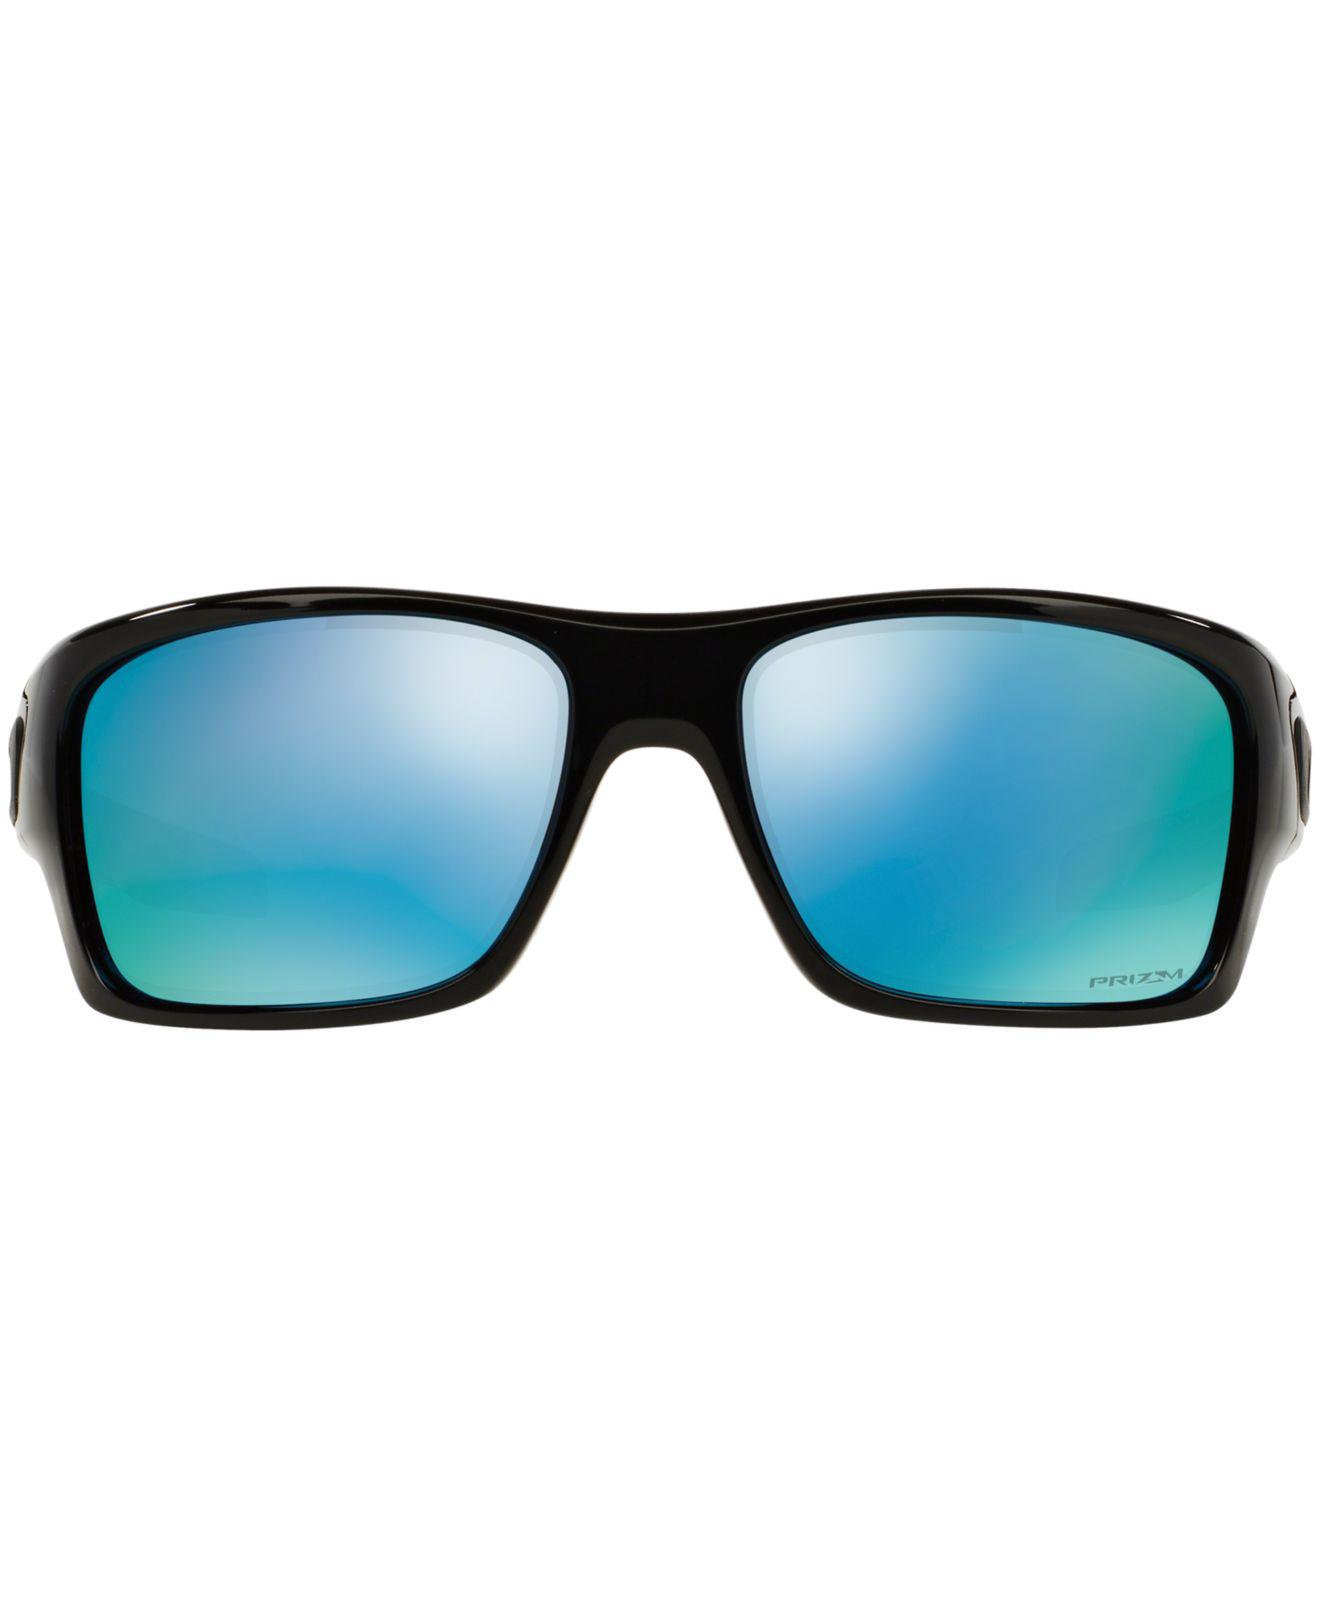 f485c8c358 Lyst - Oakley Polarized Sunglasses